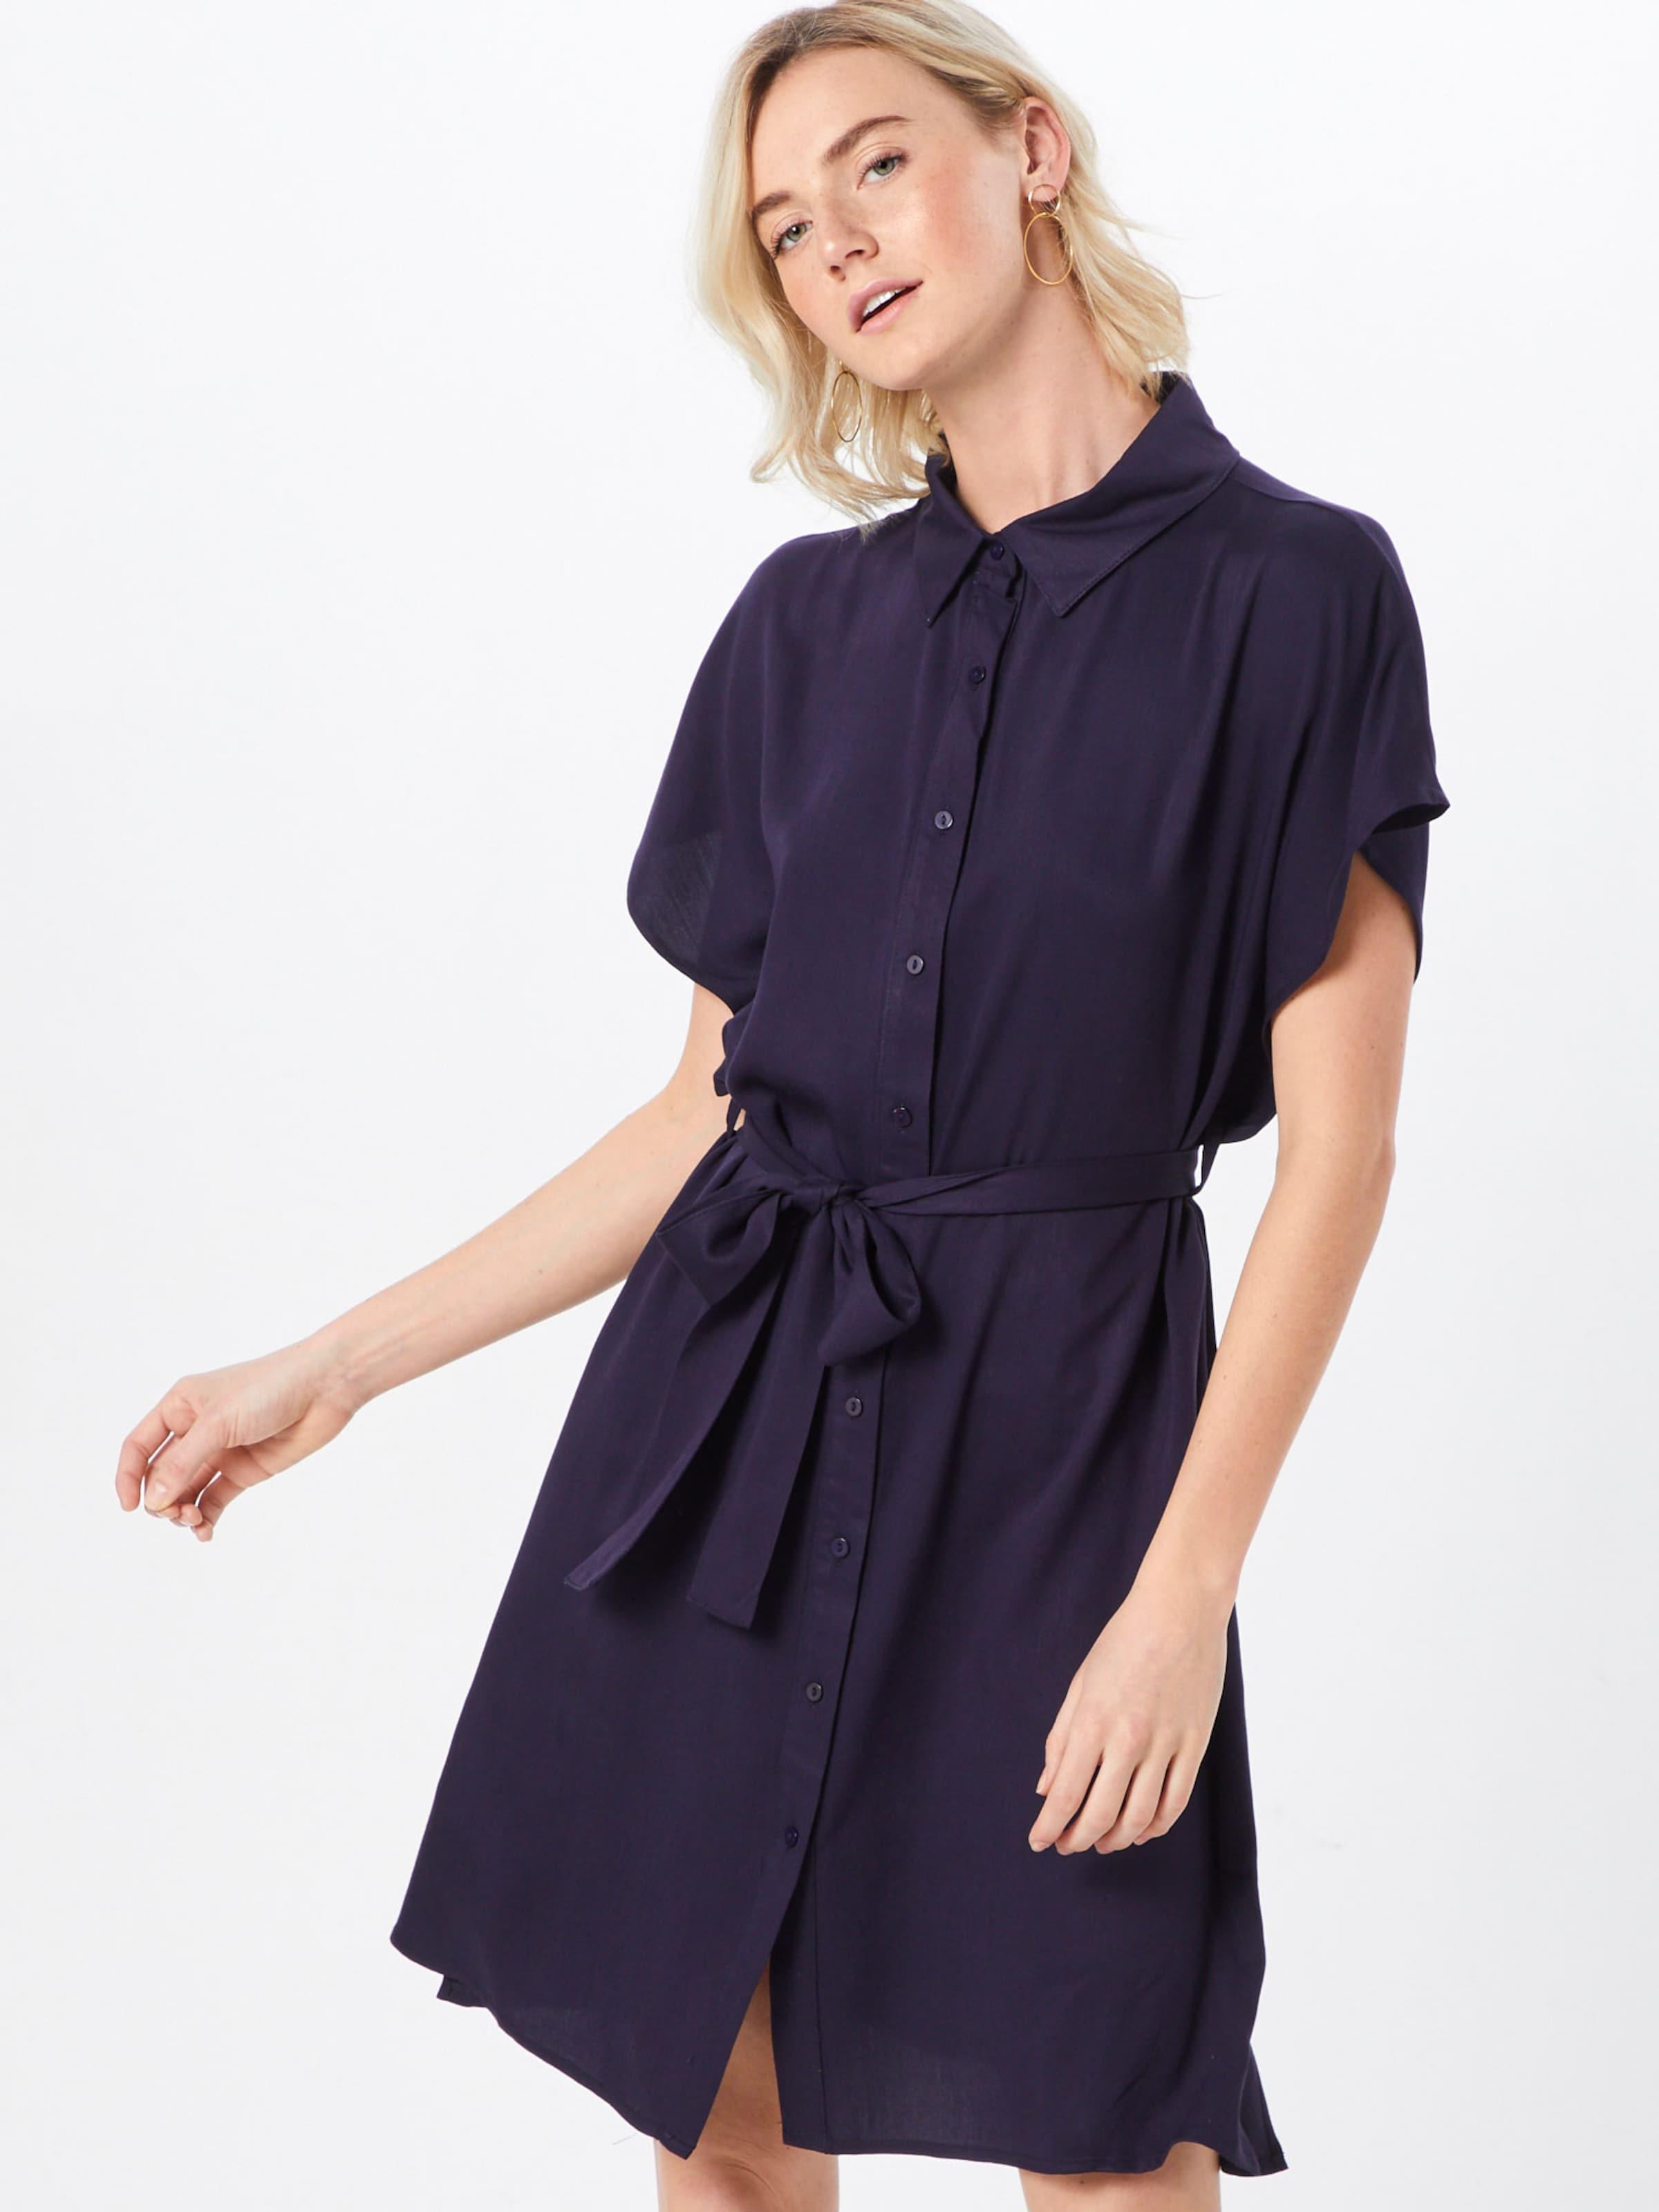 Artlove Bleu Robe chemise Paris En Marine zMqSVUp